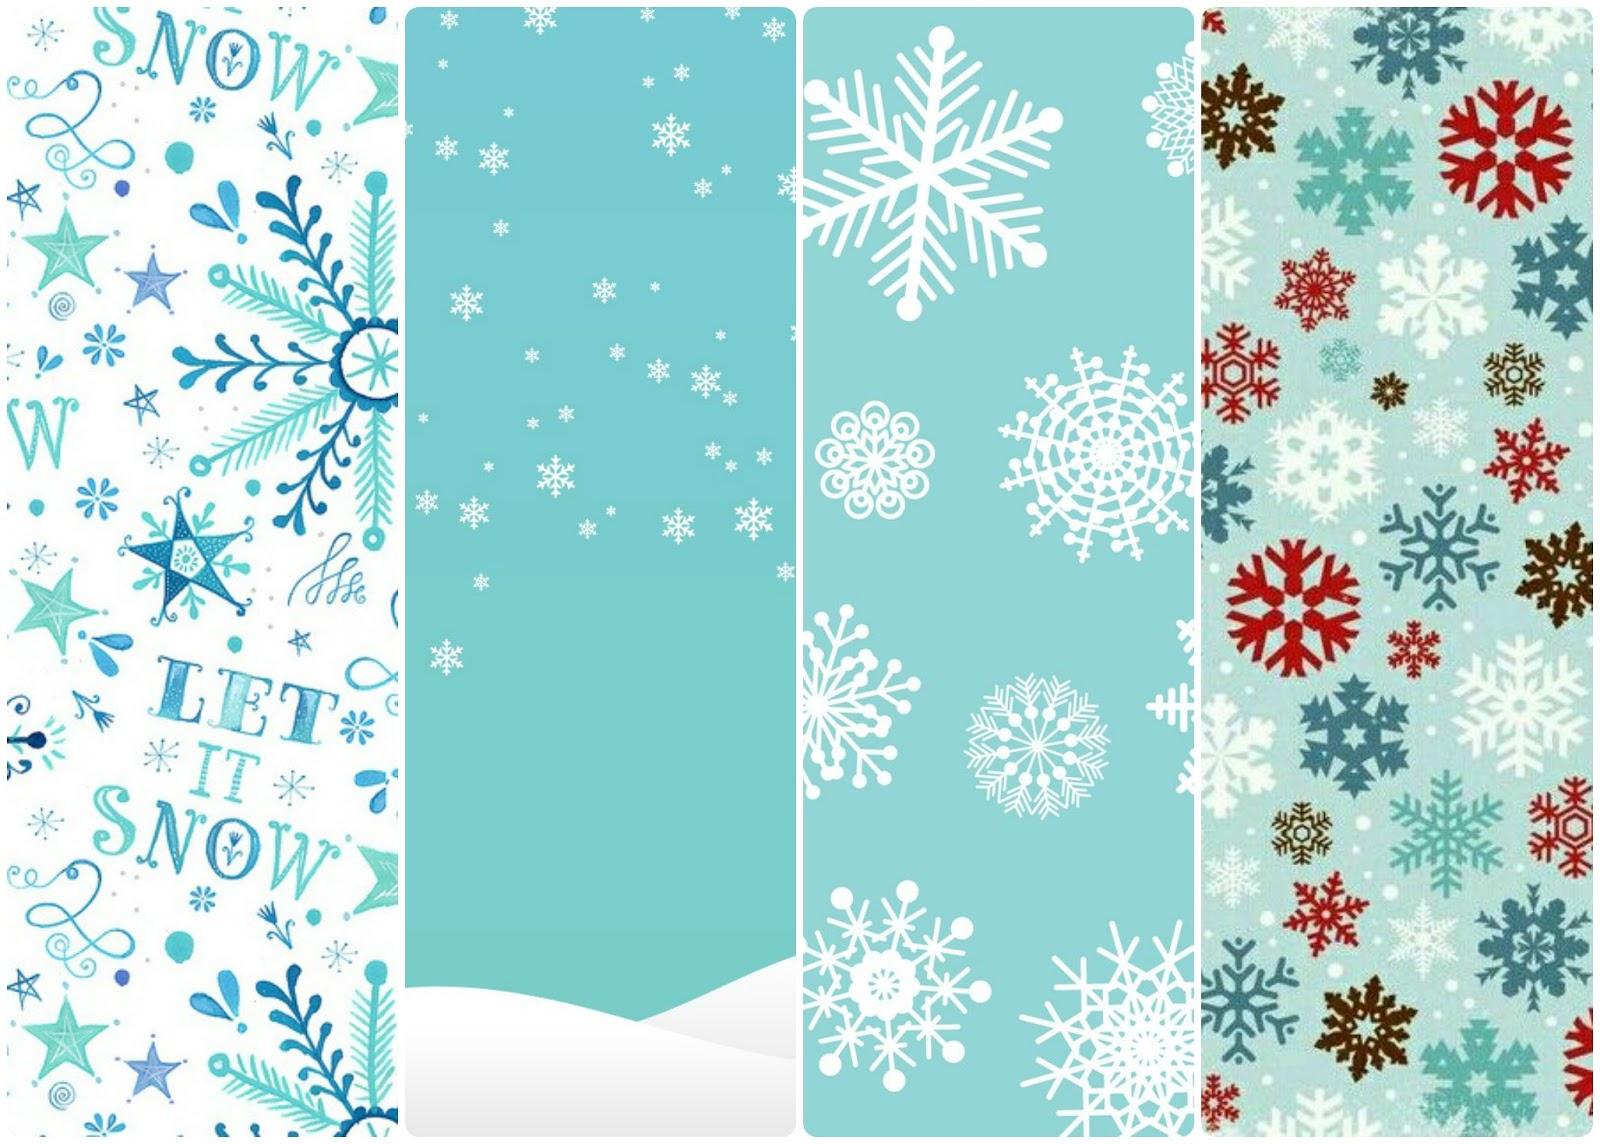 fondos de pantalla whatsapp navideños copos de nieve snowflakes xmas pattern background free iphone android gratis free fondo whatsapp para celular